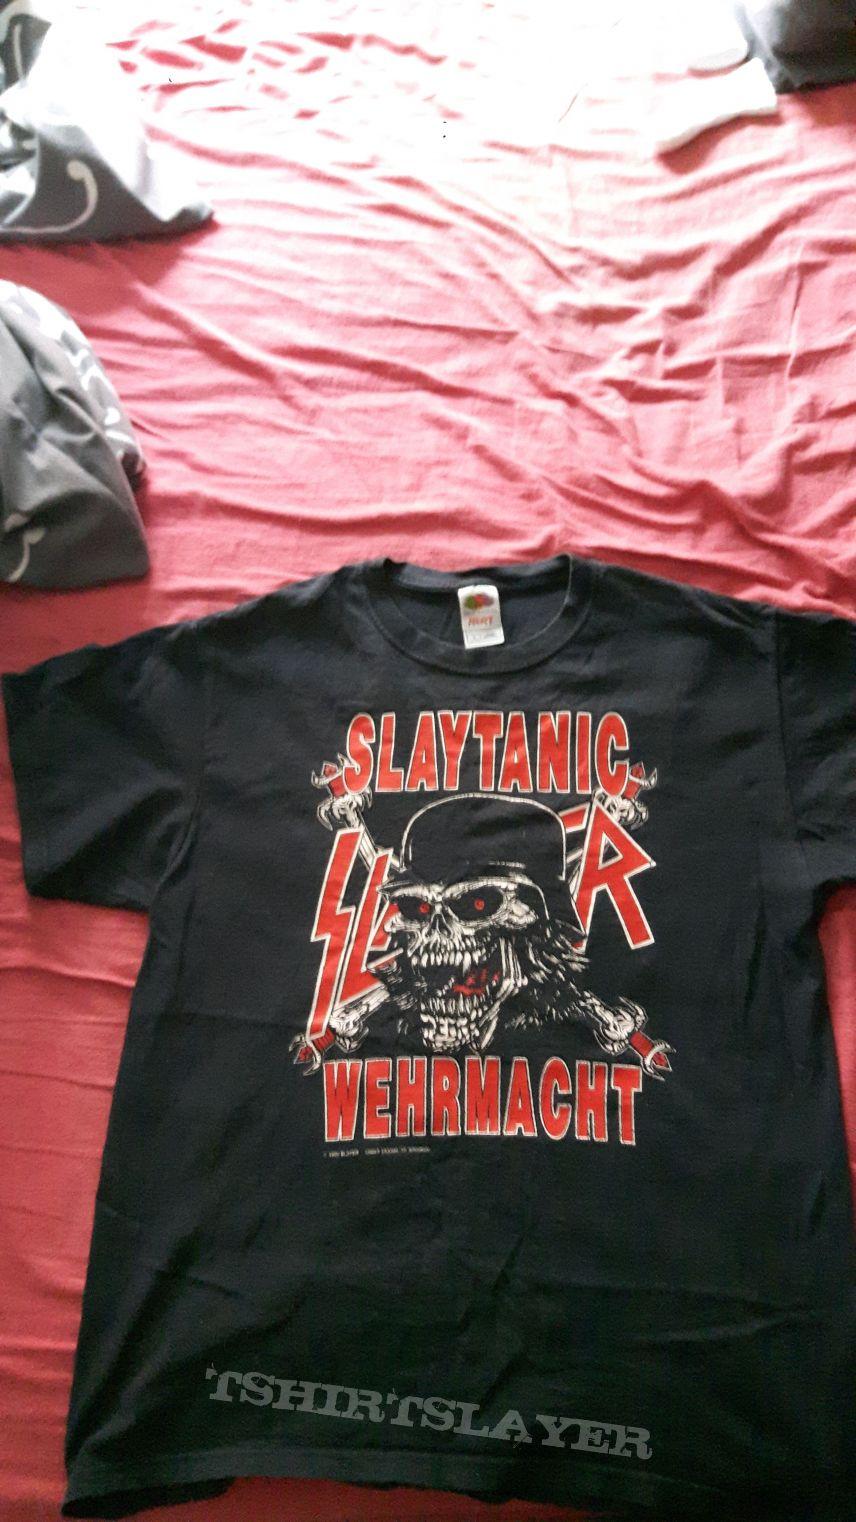 Slaytanic shirt